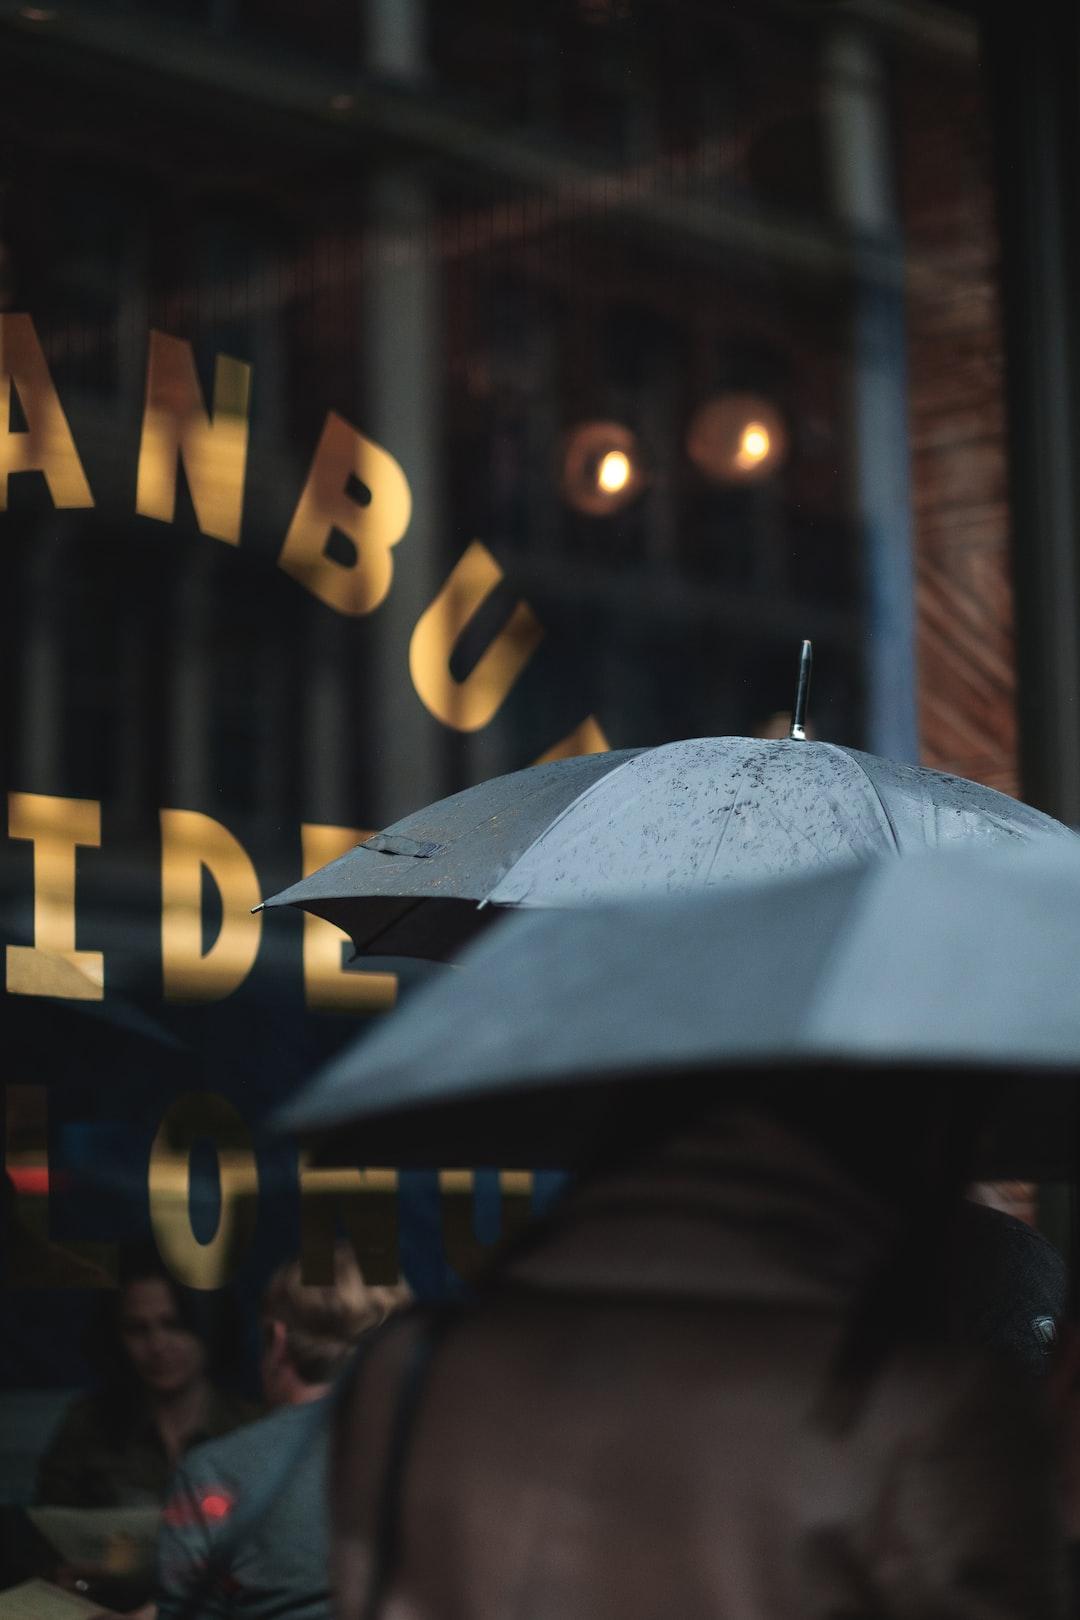 Rainy Umbrellas Photo By Craig Whitehead Sixstreetunder